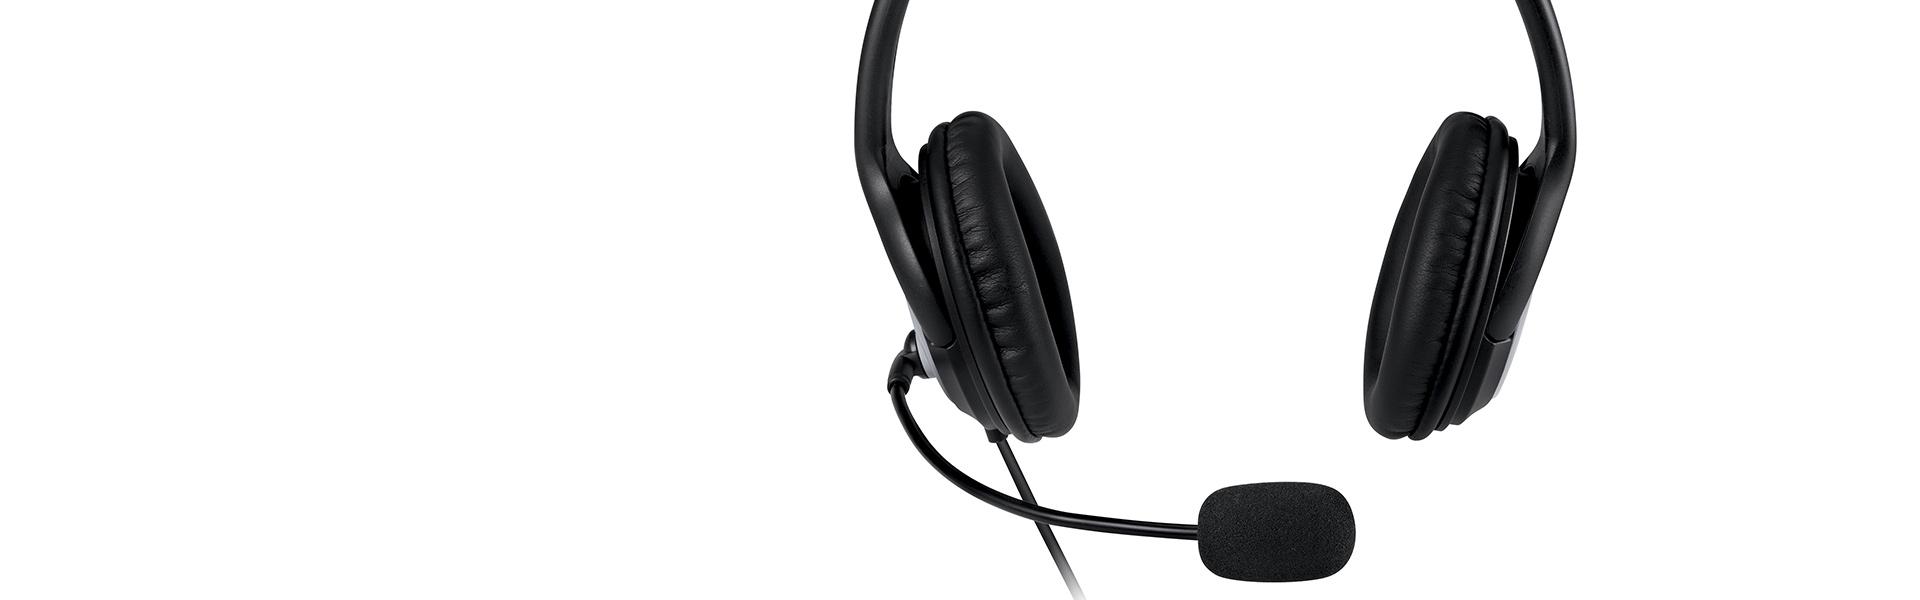 Headsets Header